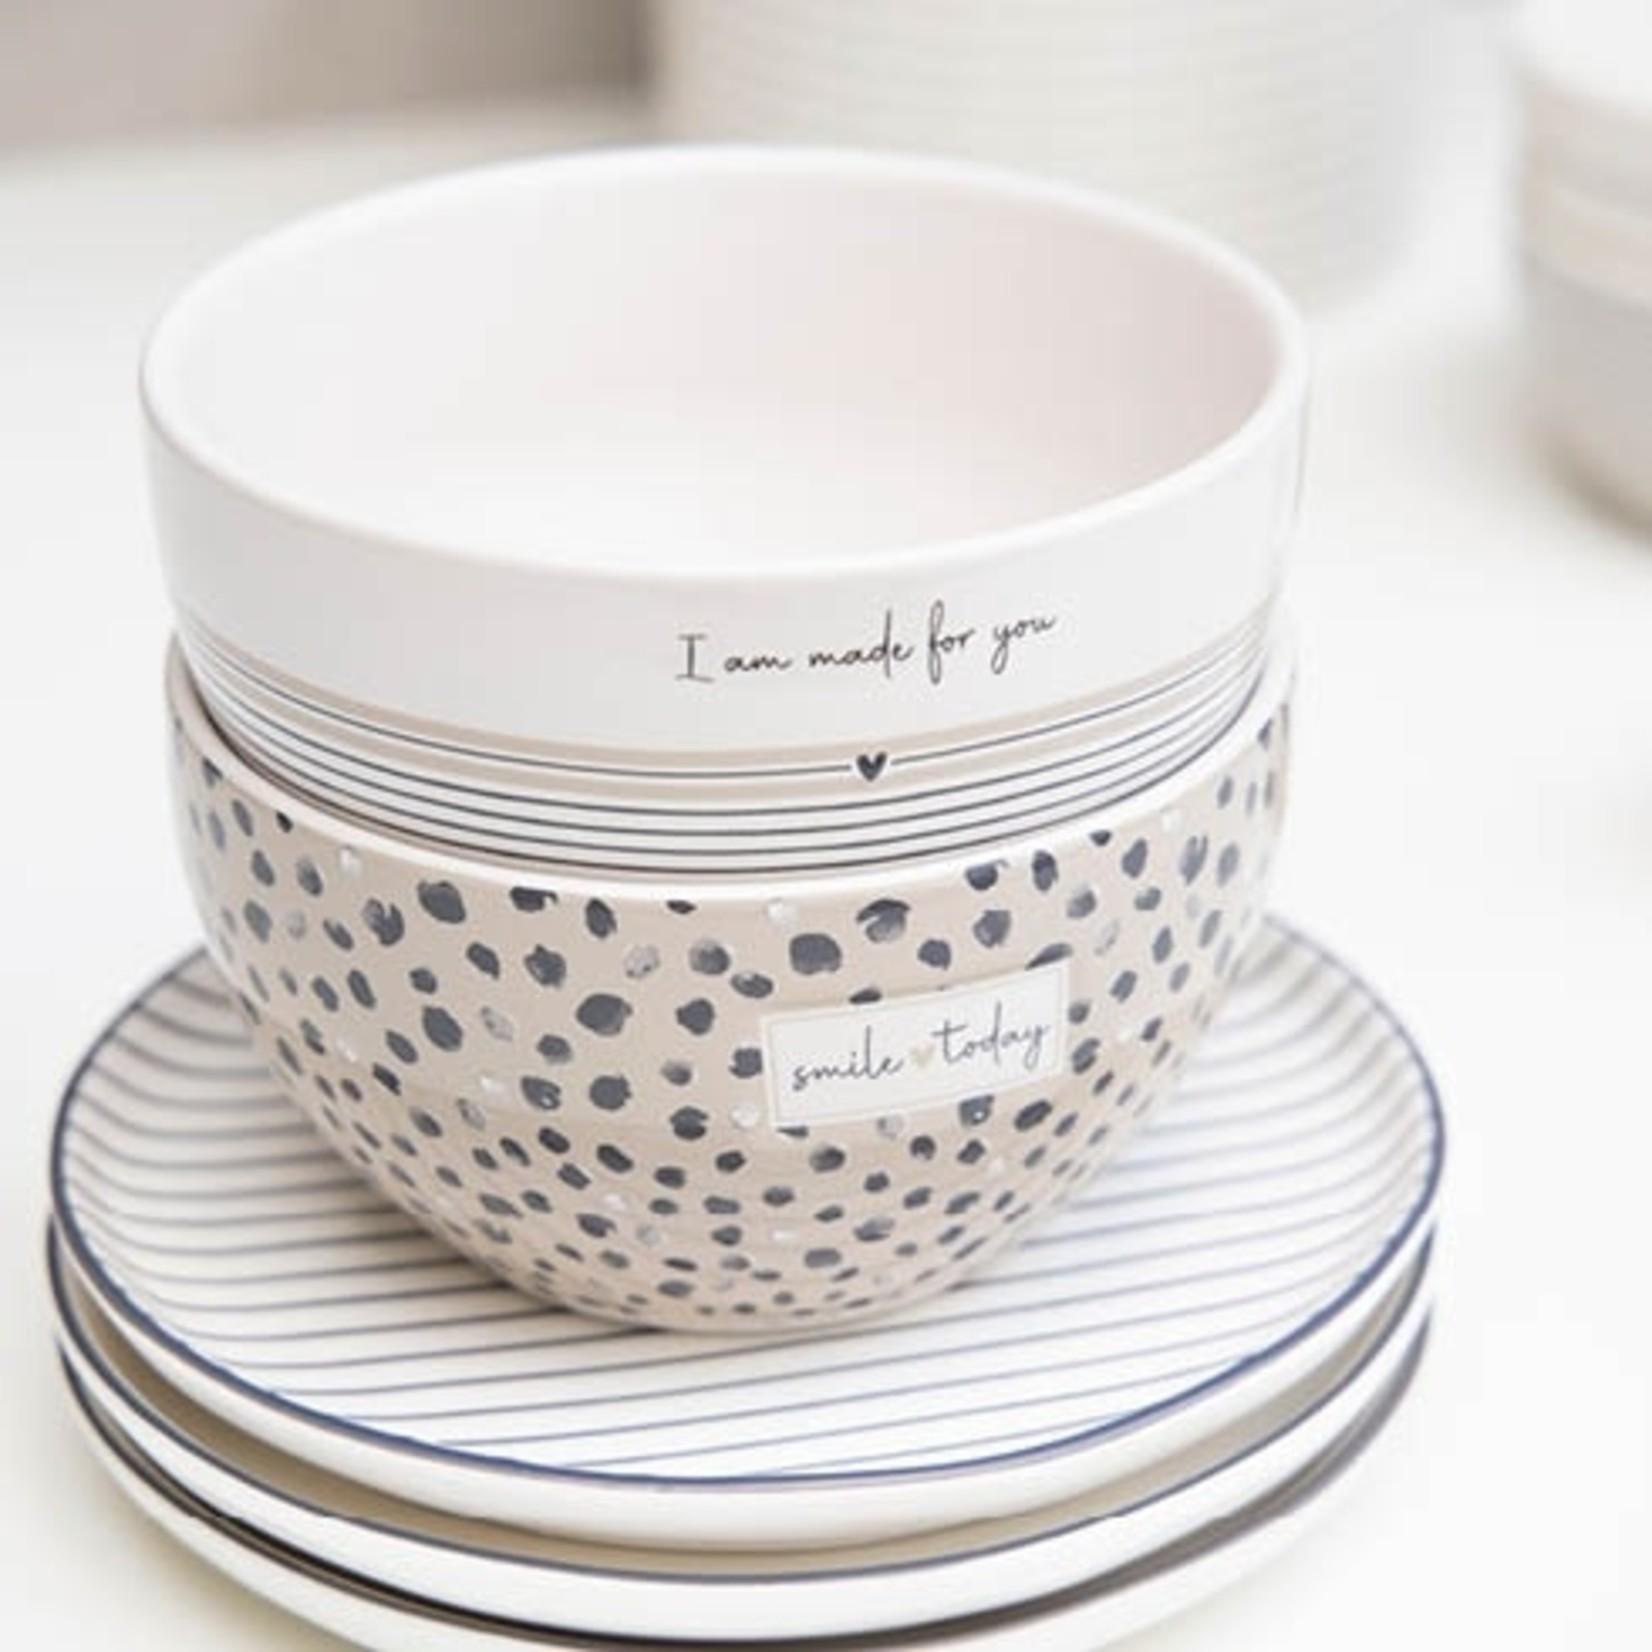 Bastion Collections Bowl Titane/Confetti Smile Today